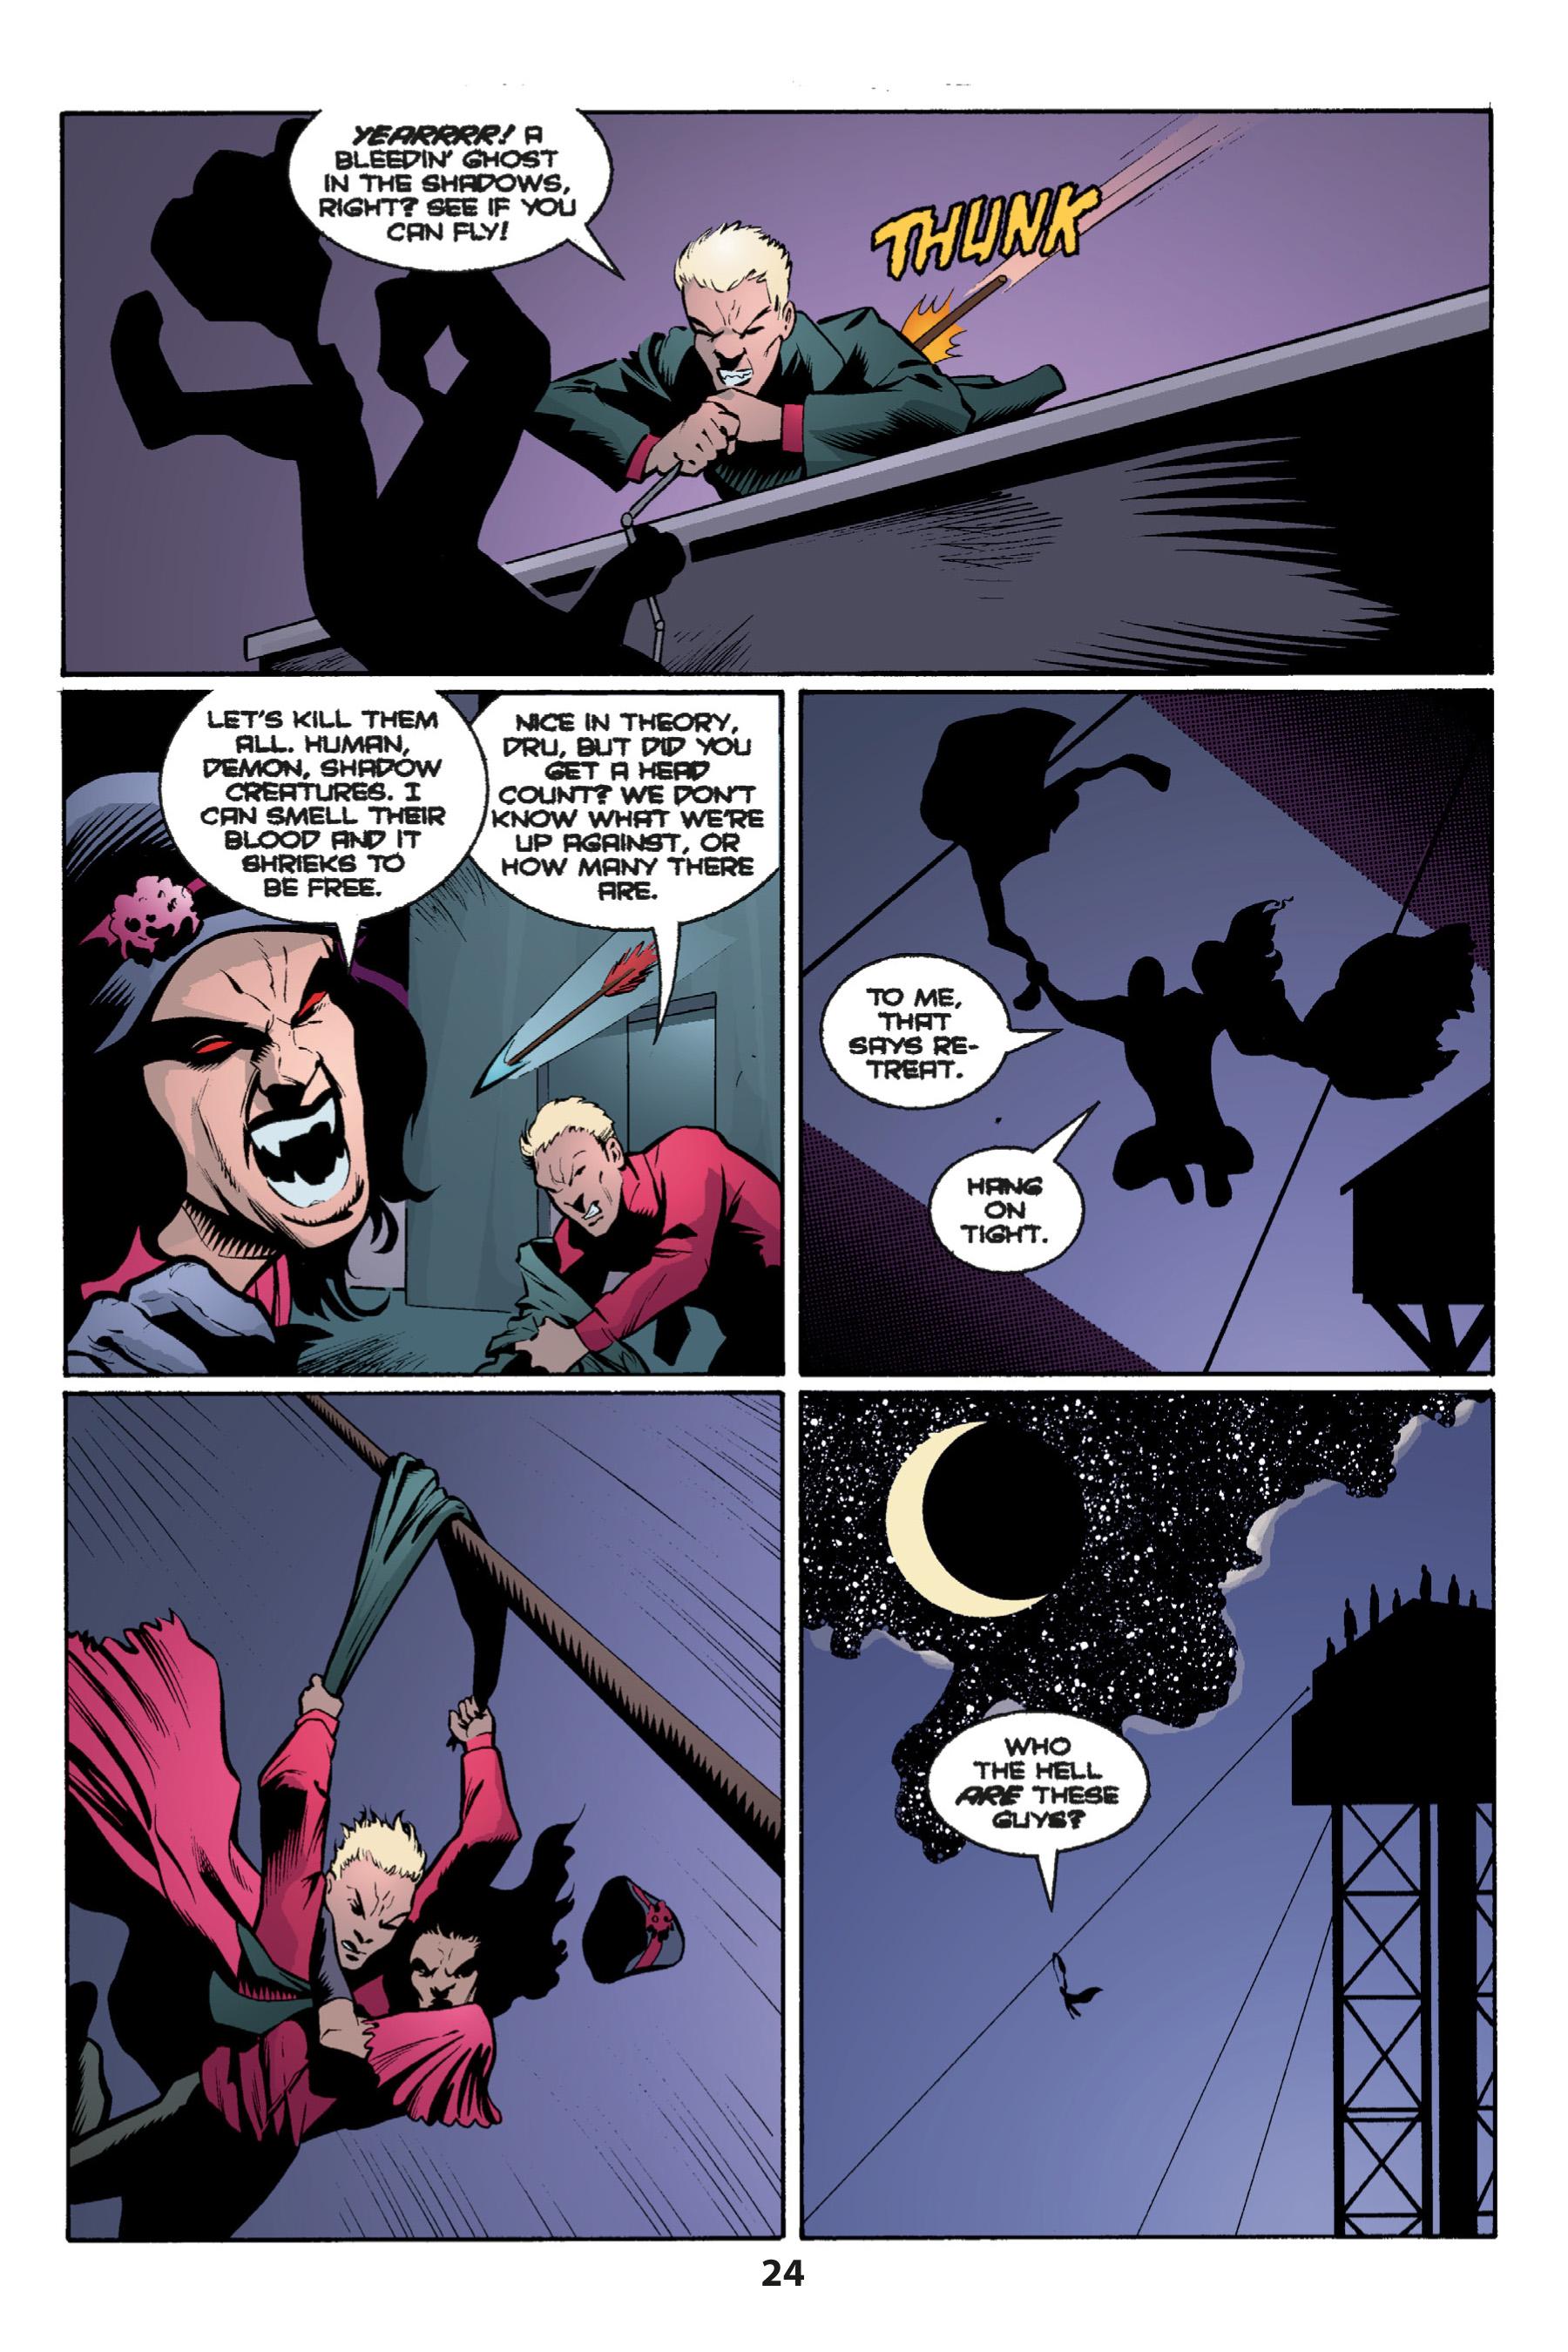 Read online Buffy the Vampire Slayer: Omnibus comic -  Issue # TPB 1 - 26